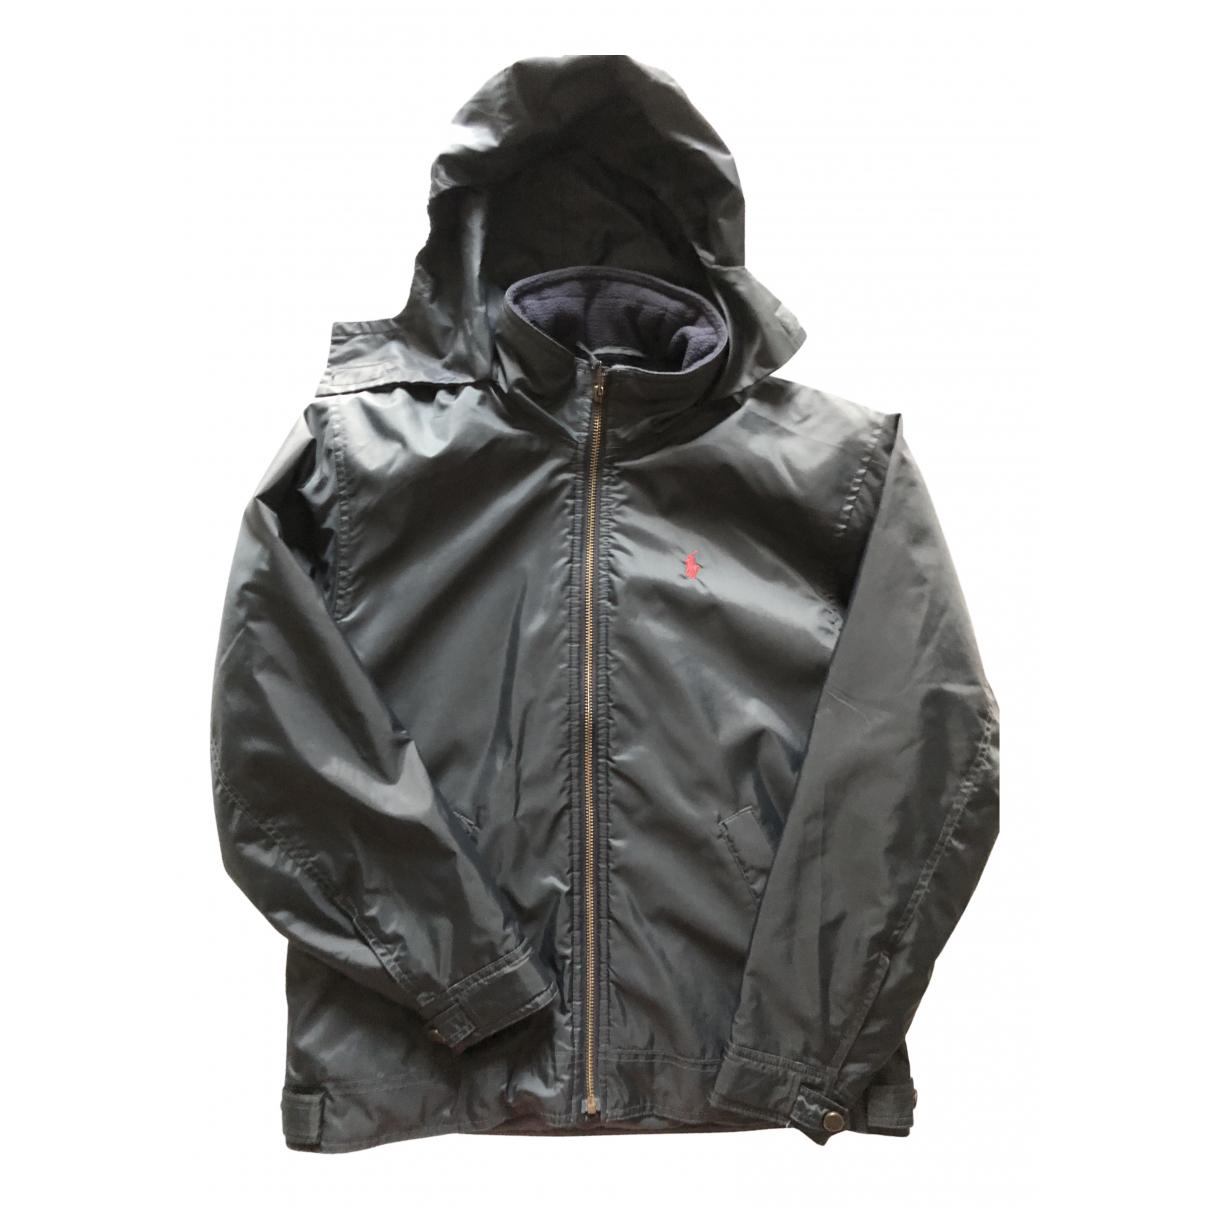 Polo Ralph Lauren N Blue jacket & coat for Kids 12 years - XS FR